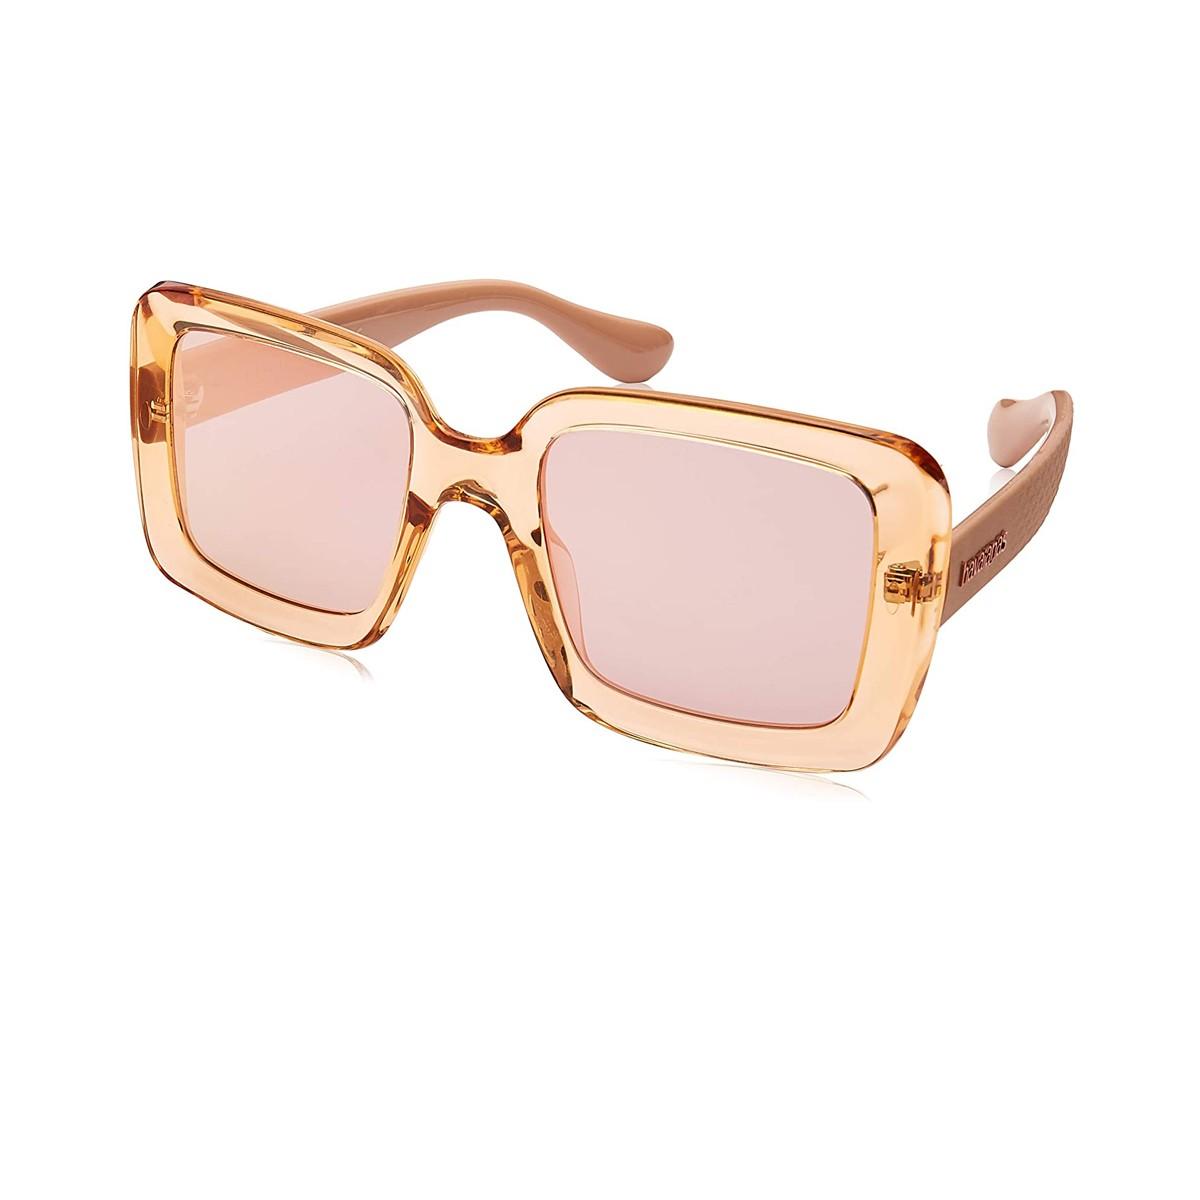 Havaianas Geriba   Women's sunglasses